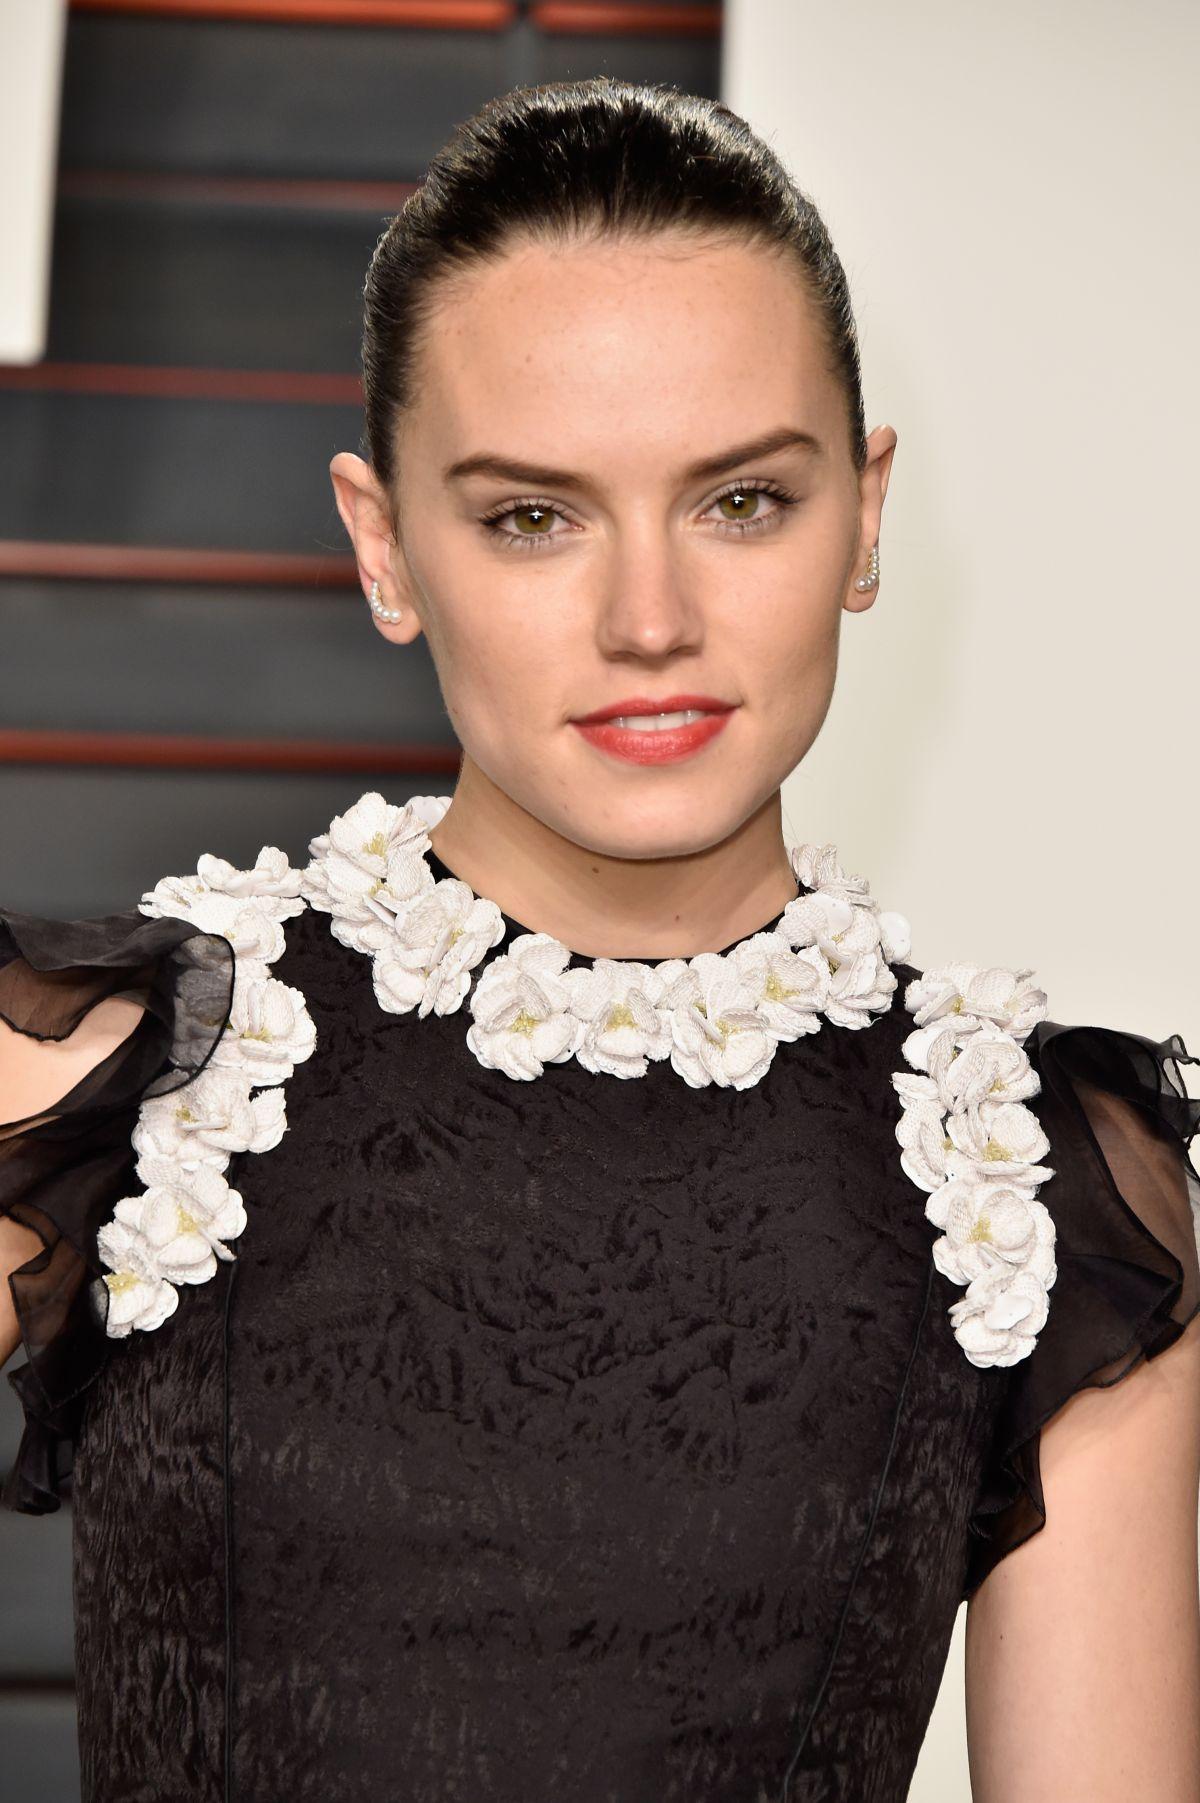 DAISY RIDLEY at Vanity Fair Oscar 2016 Party in Beverly Hills 02/28/2016